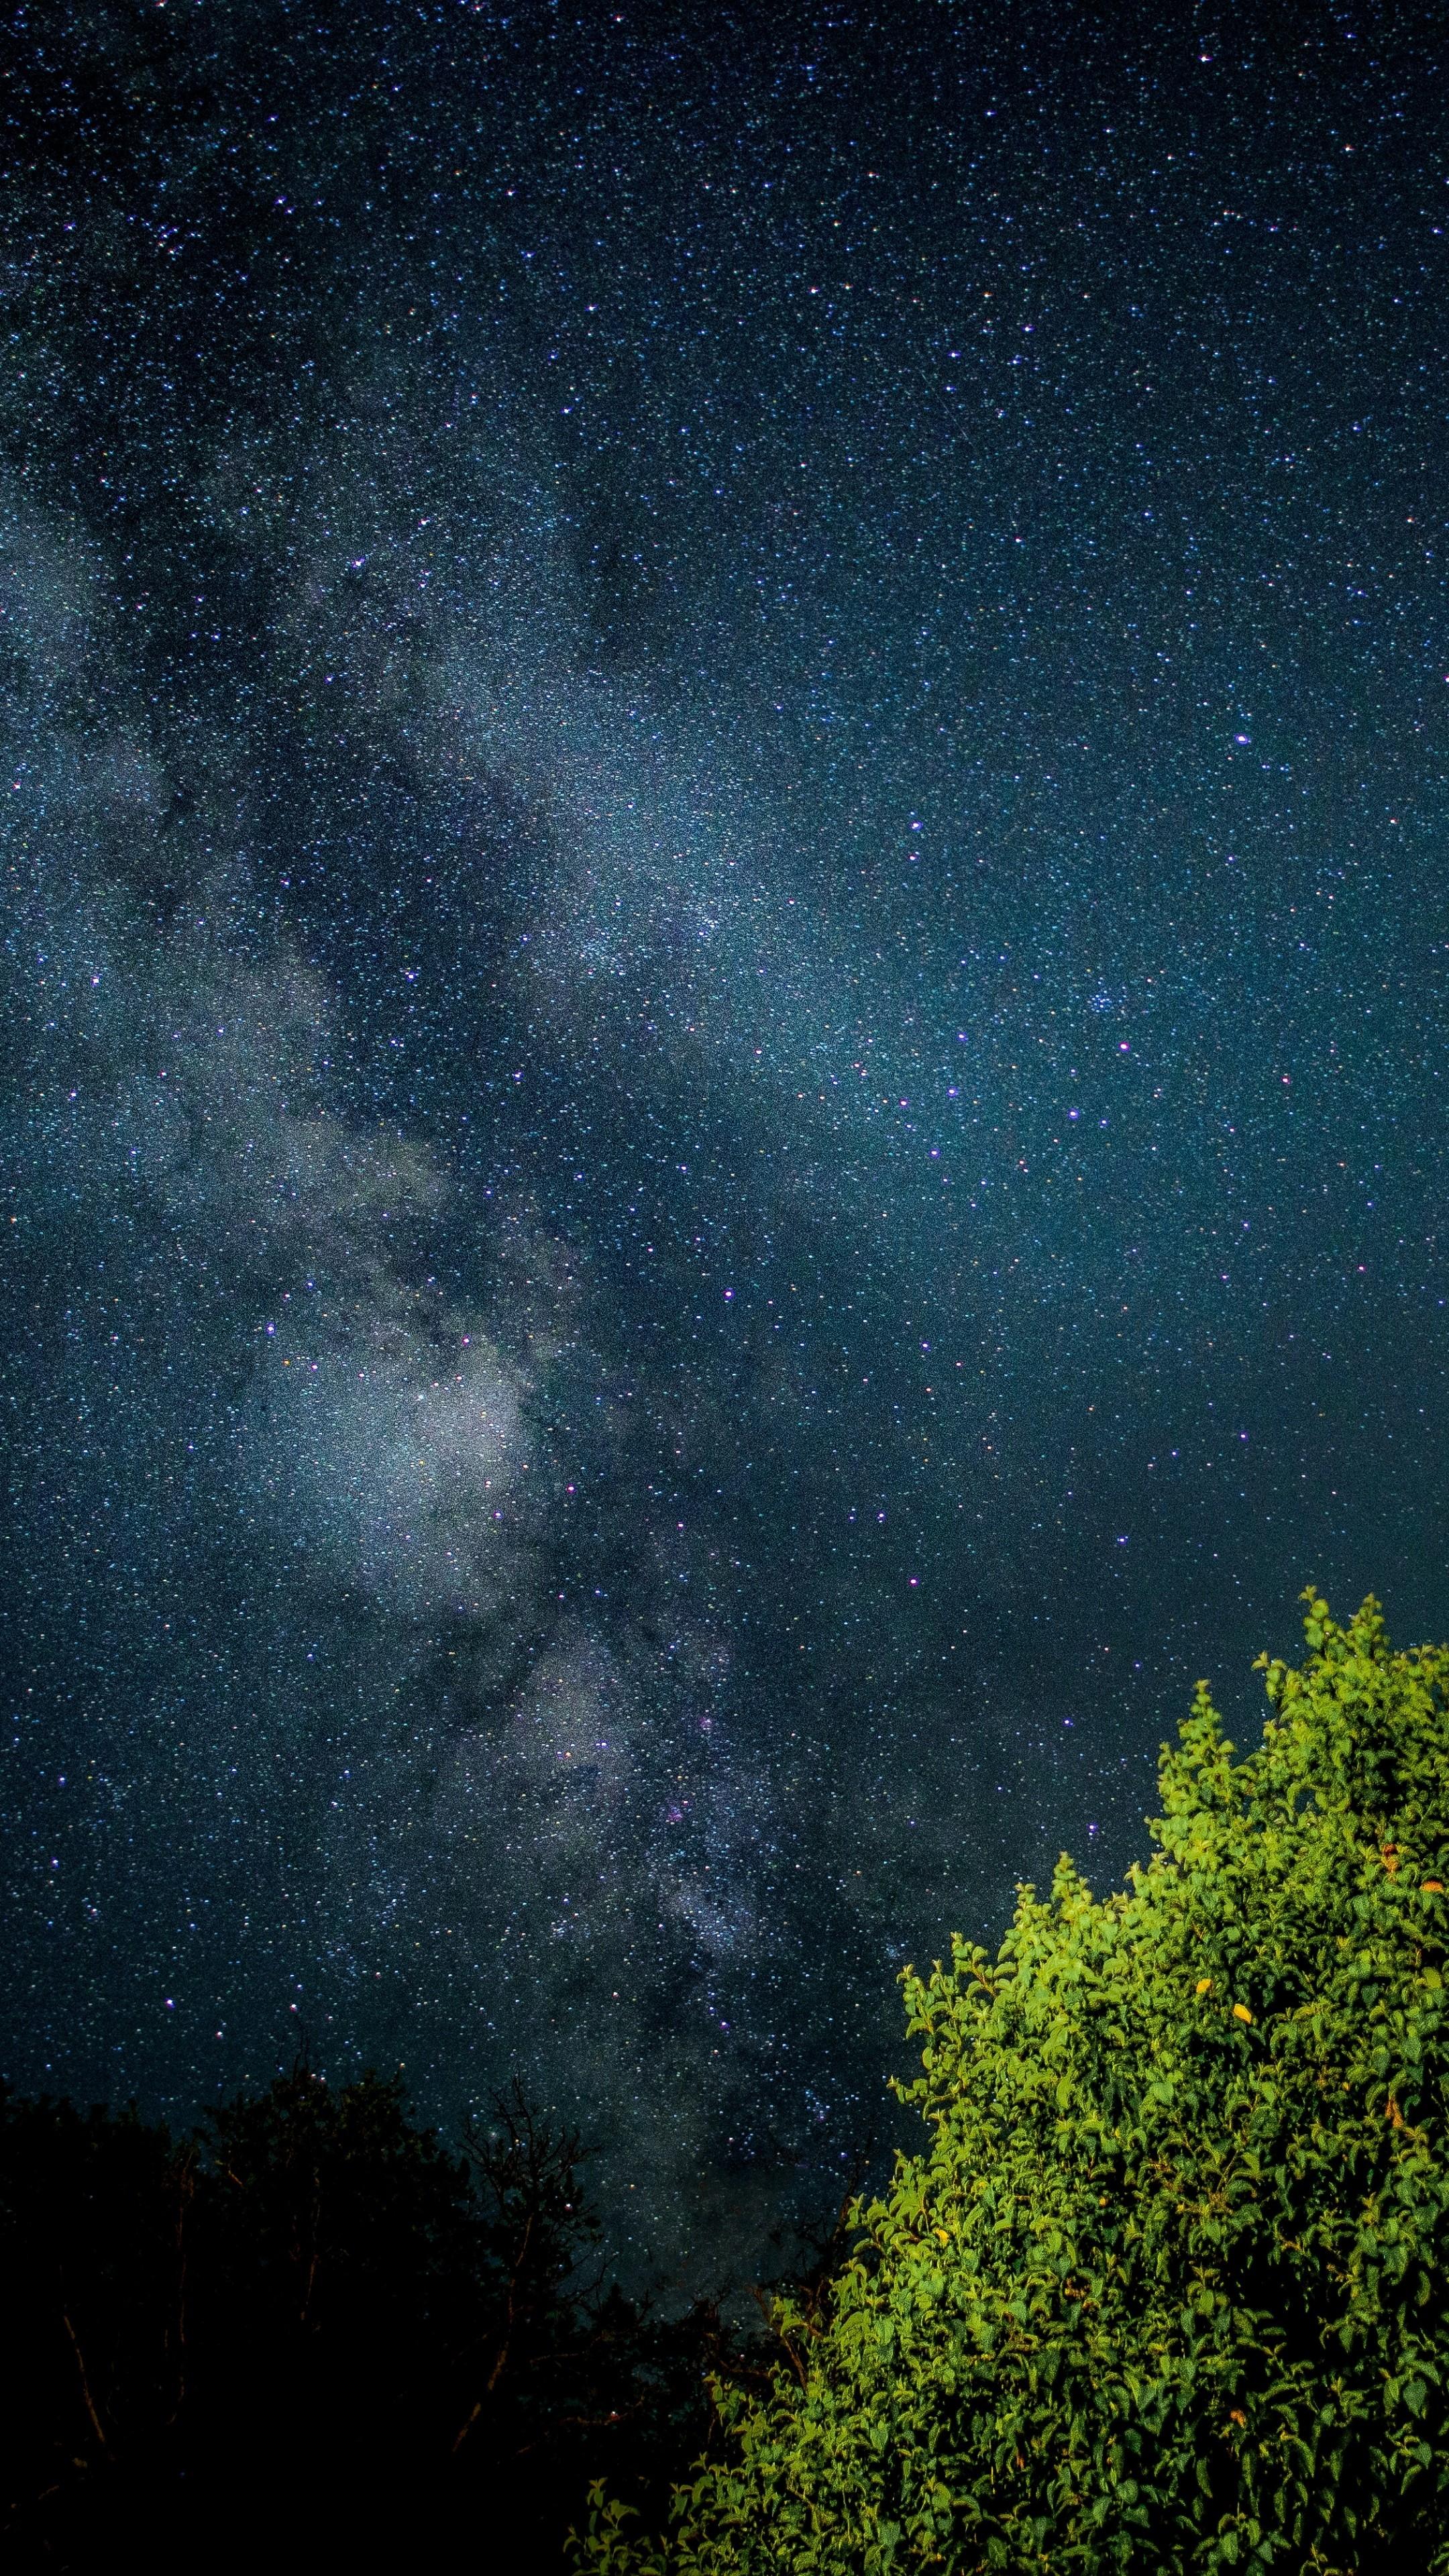 Islamic 3d Wallpapers Download Starry Sky Night Lights Wallpaper 2160x3840